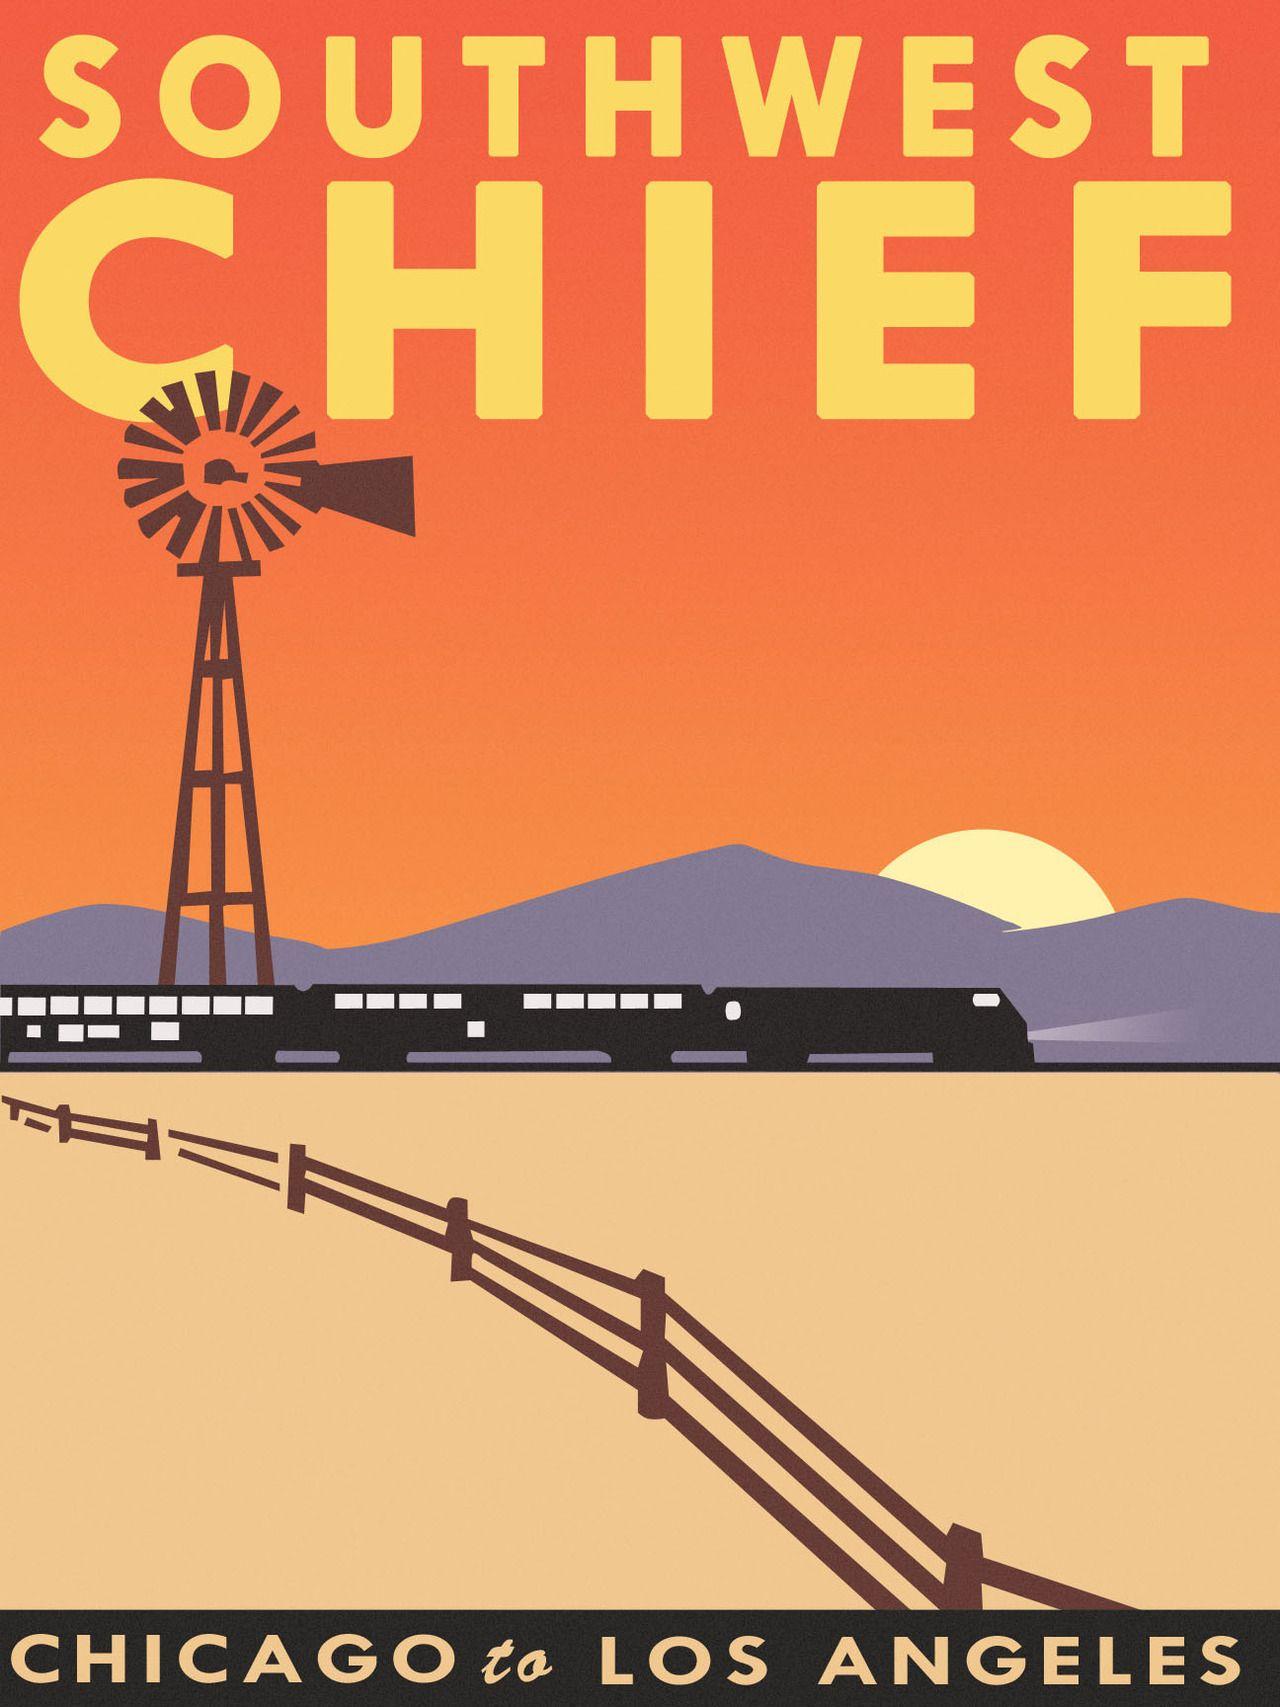 Amtrak Southwest Chief-Los Angeles to Albuquerque - YouTube